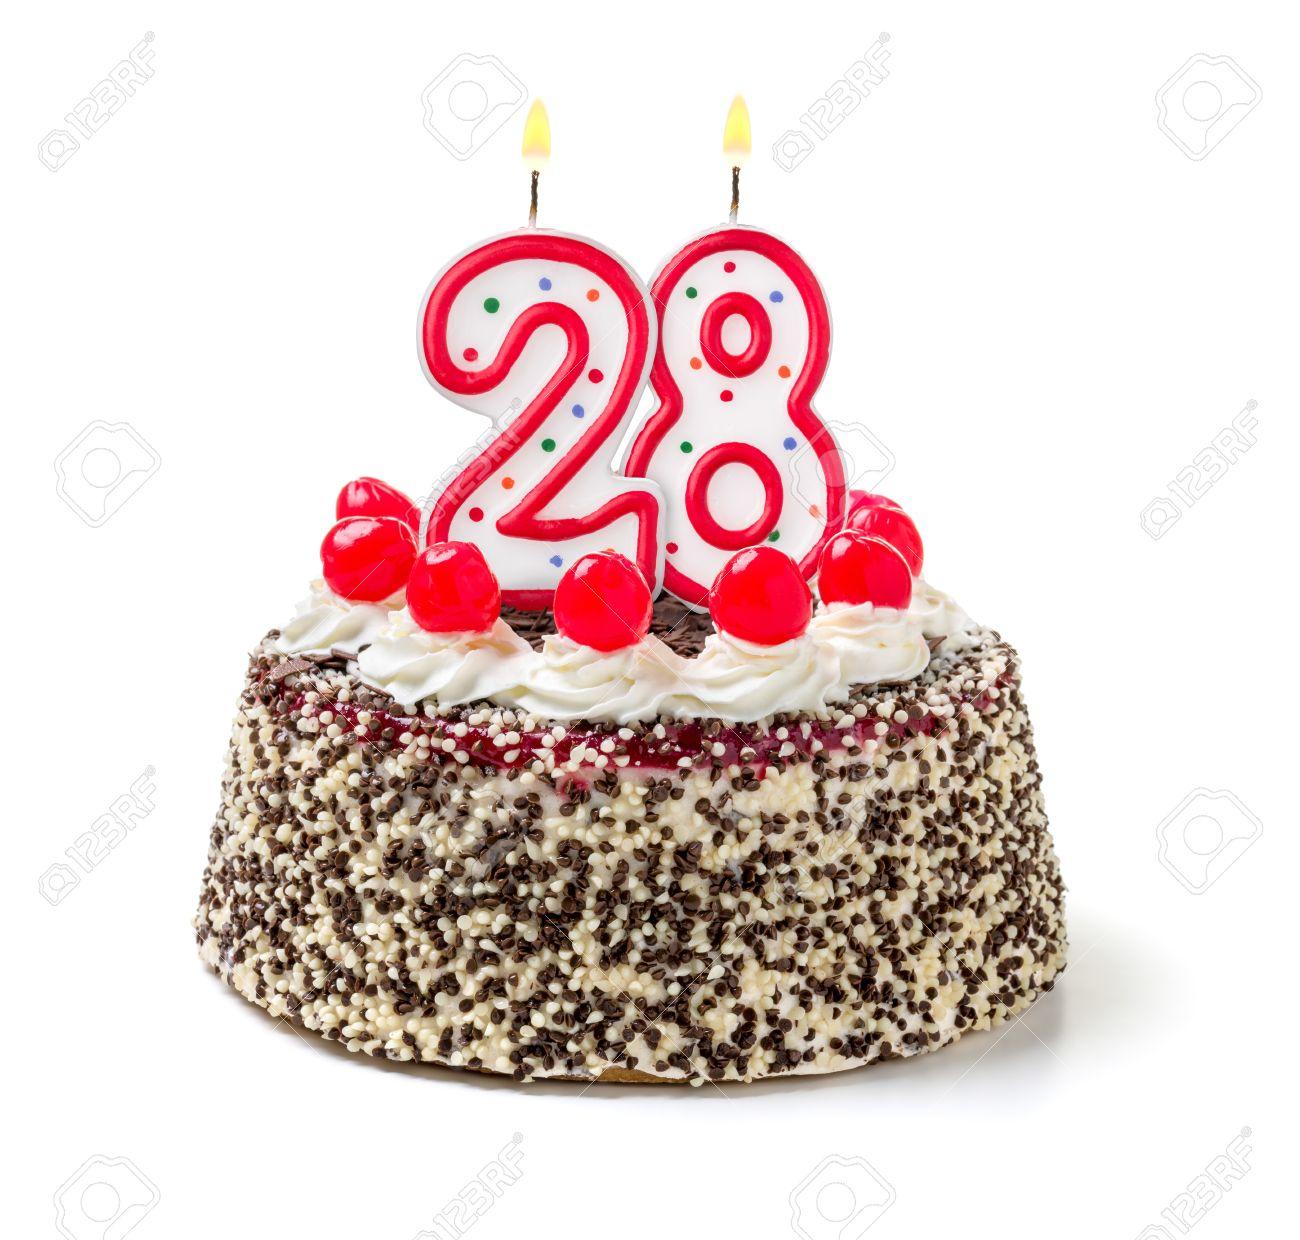 Birthday Cake With Burning Candle Number 28 Stock Photo